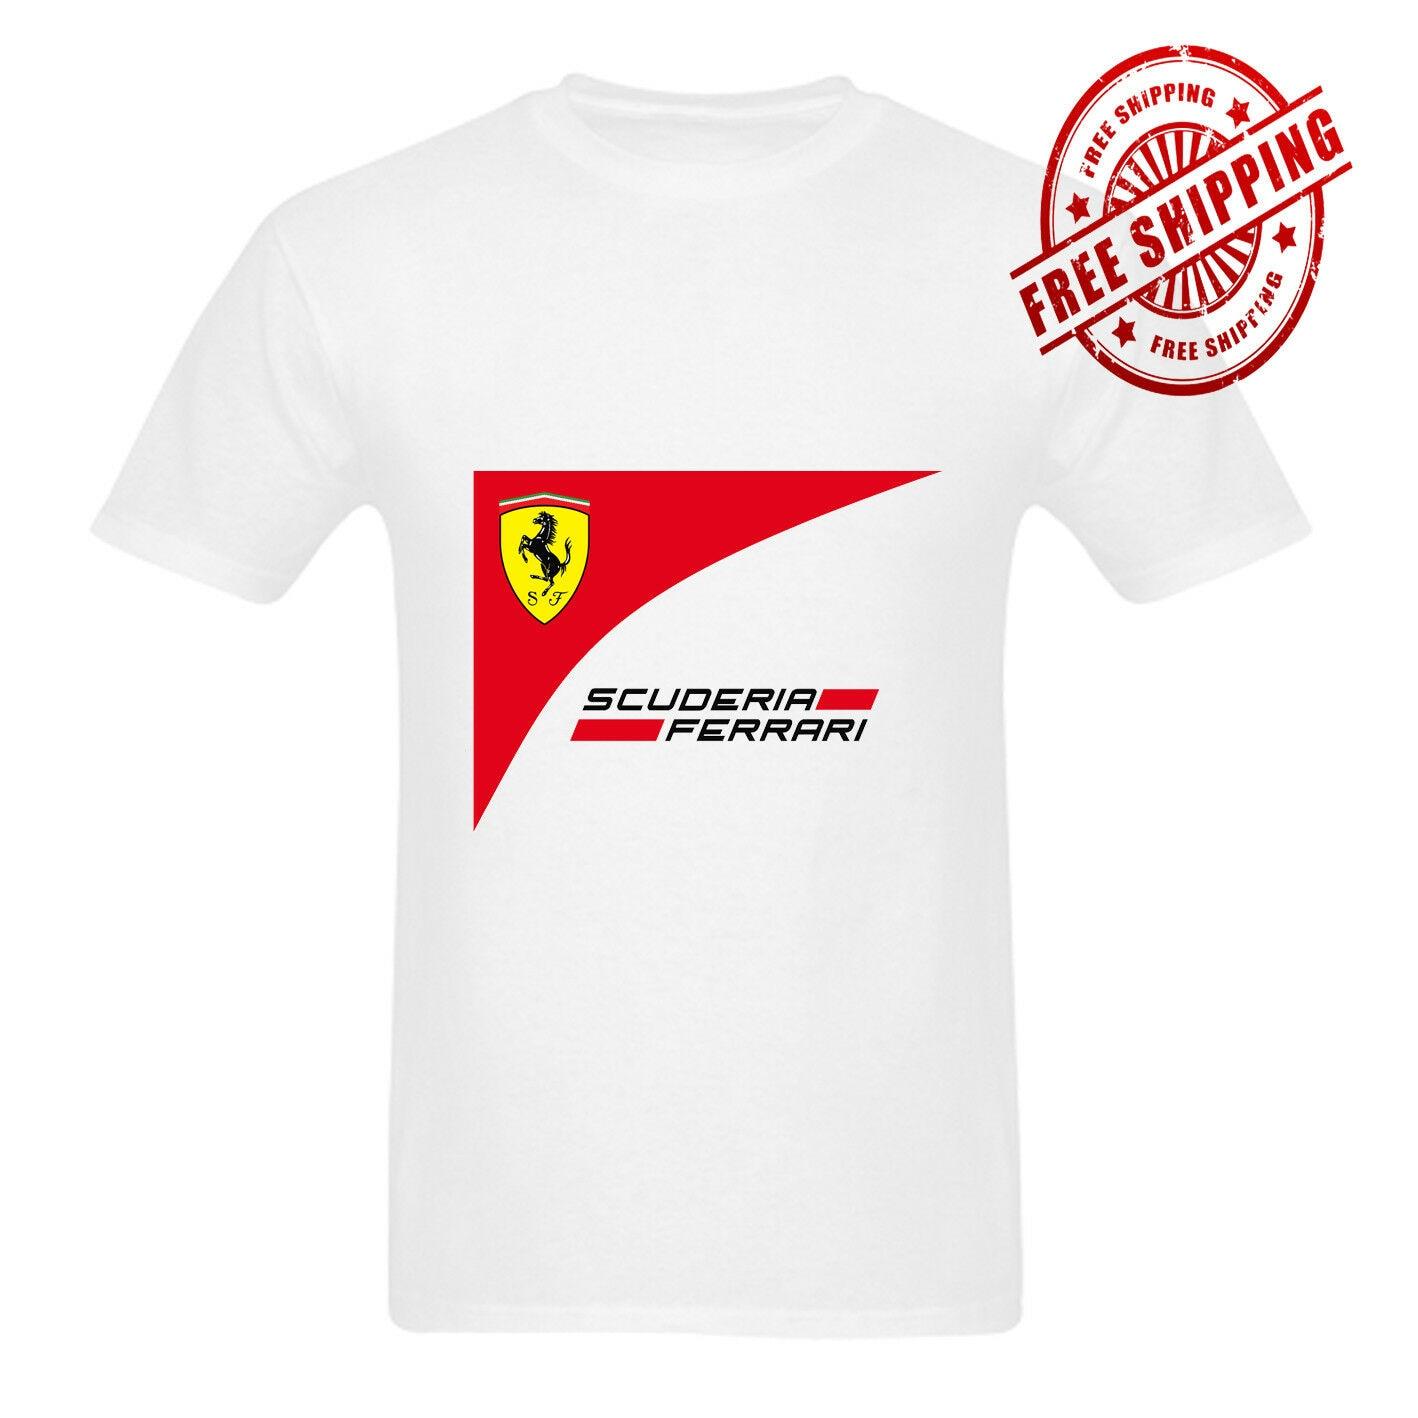 Scuderia White T Shirt Unisex Size S-3XL